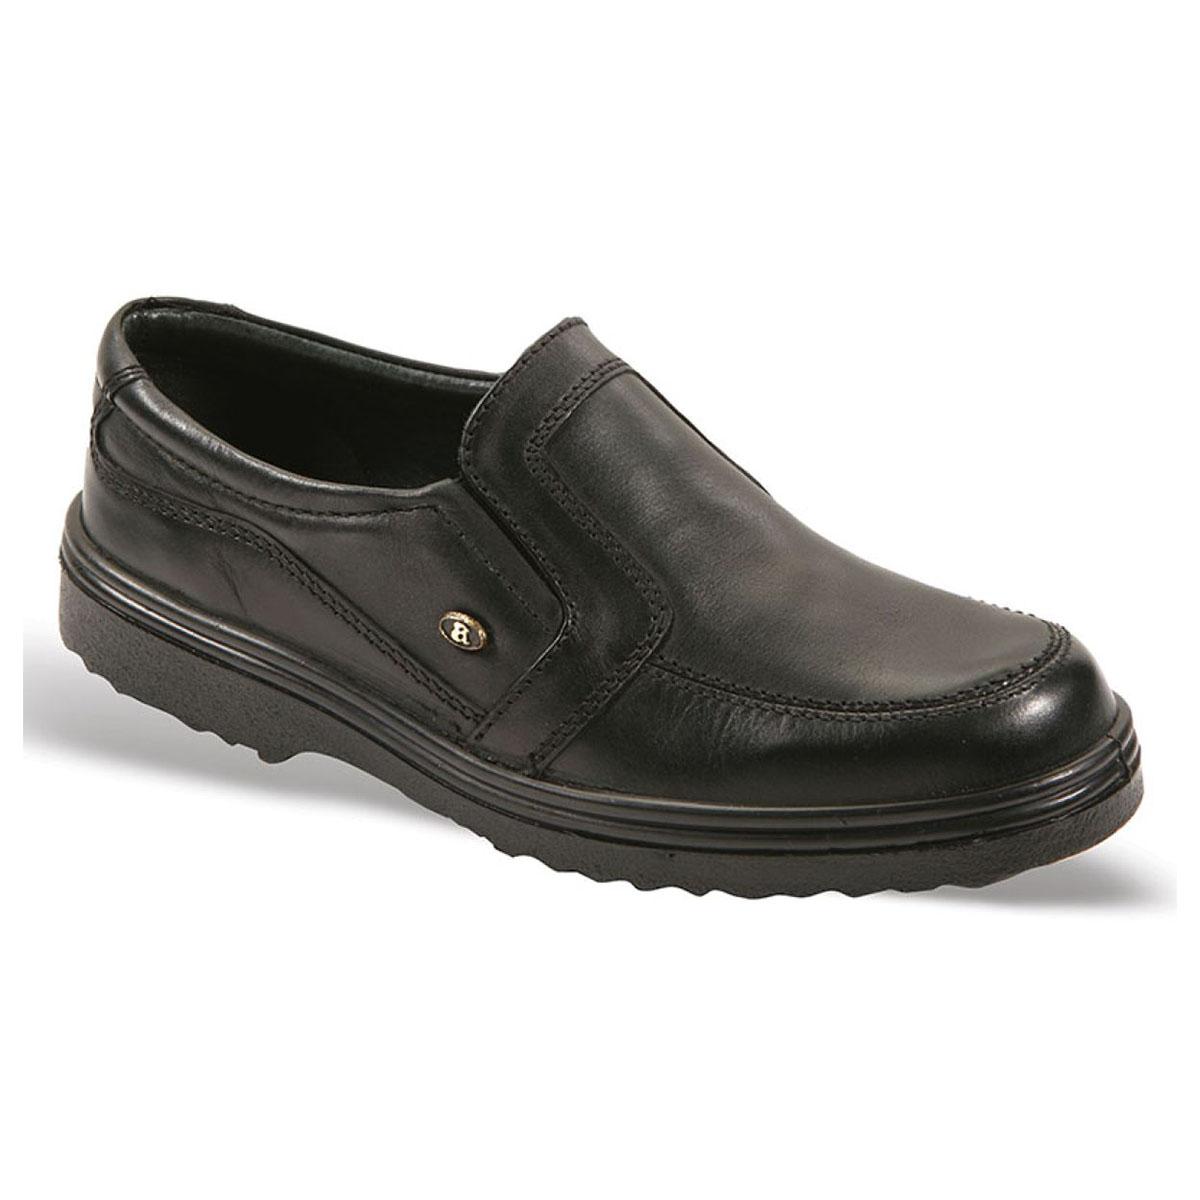 Casual ανδρικά παπούτσια Νο 0189 - Μαύρα